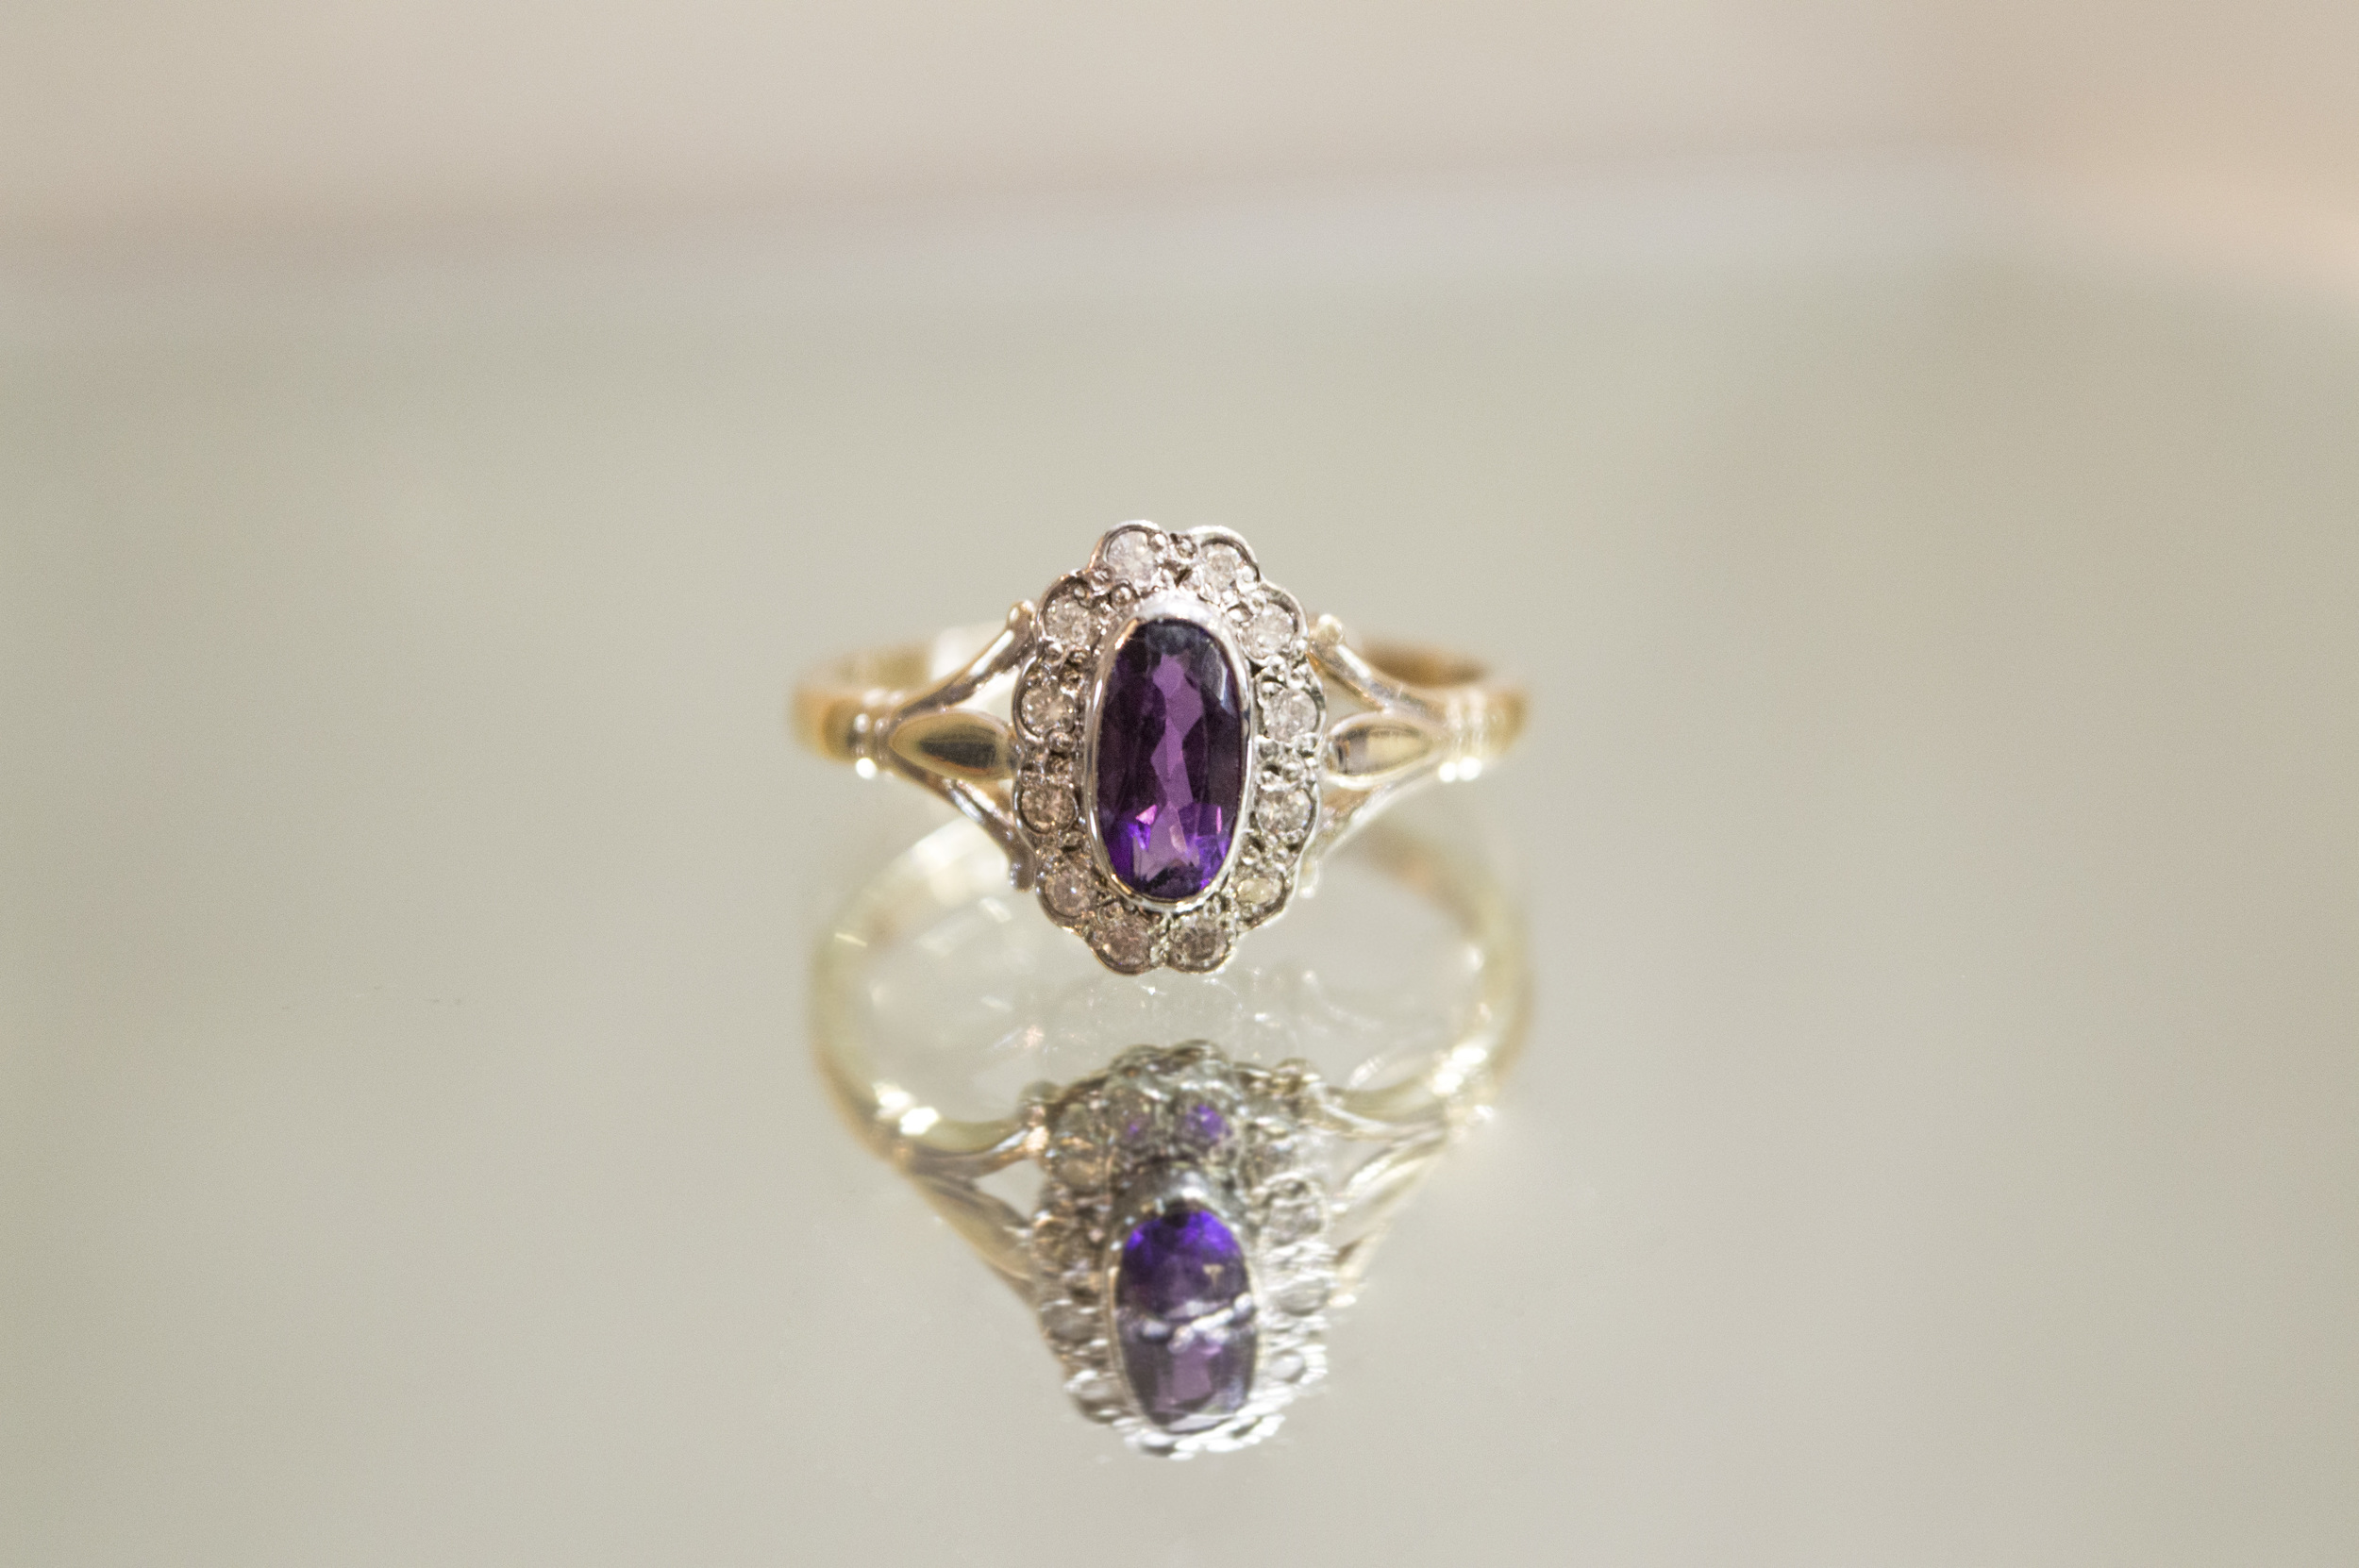 £195 - Diamond & Amethyst Ring